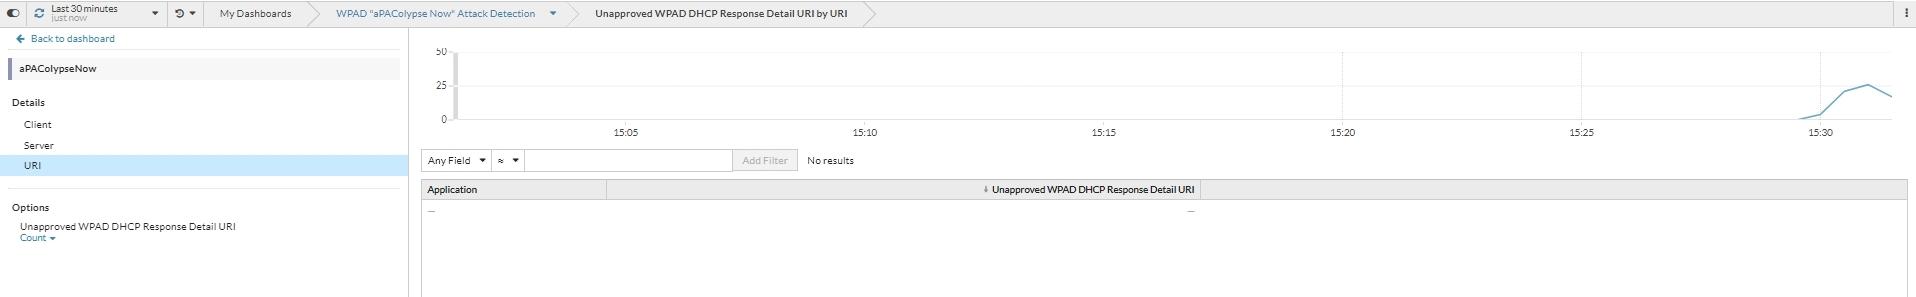 Web Proxy Auto-Discovery (WPAD) Security Bundle | ExtraHop